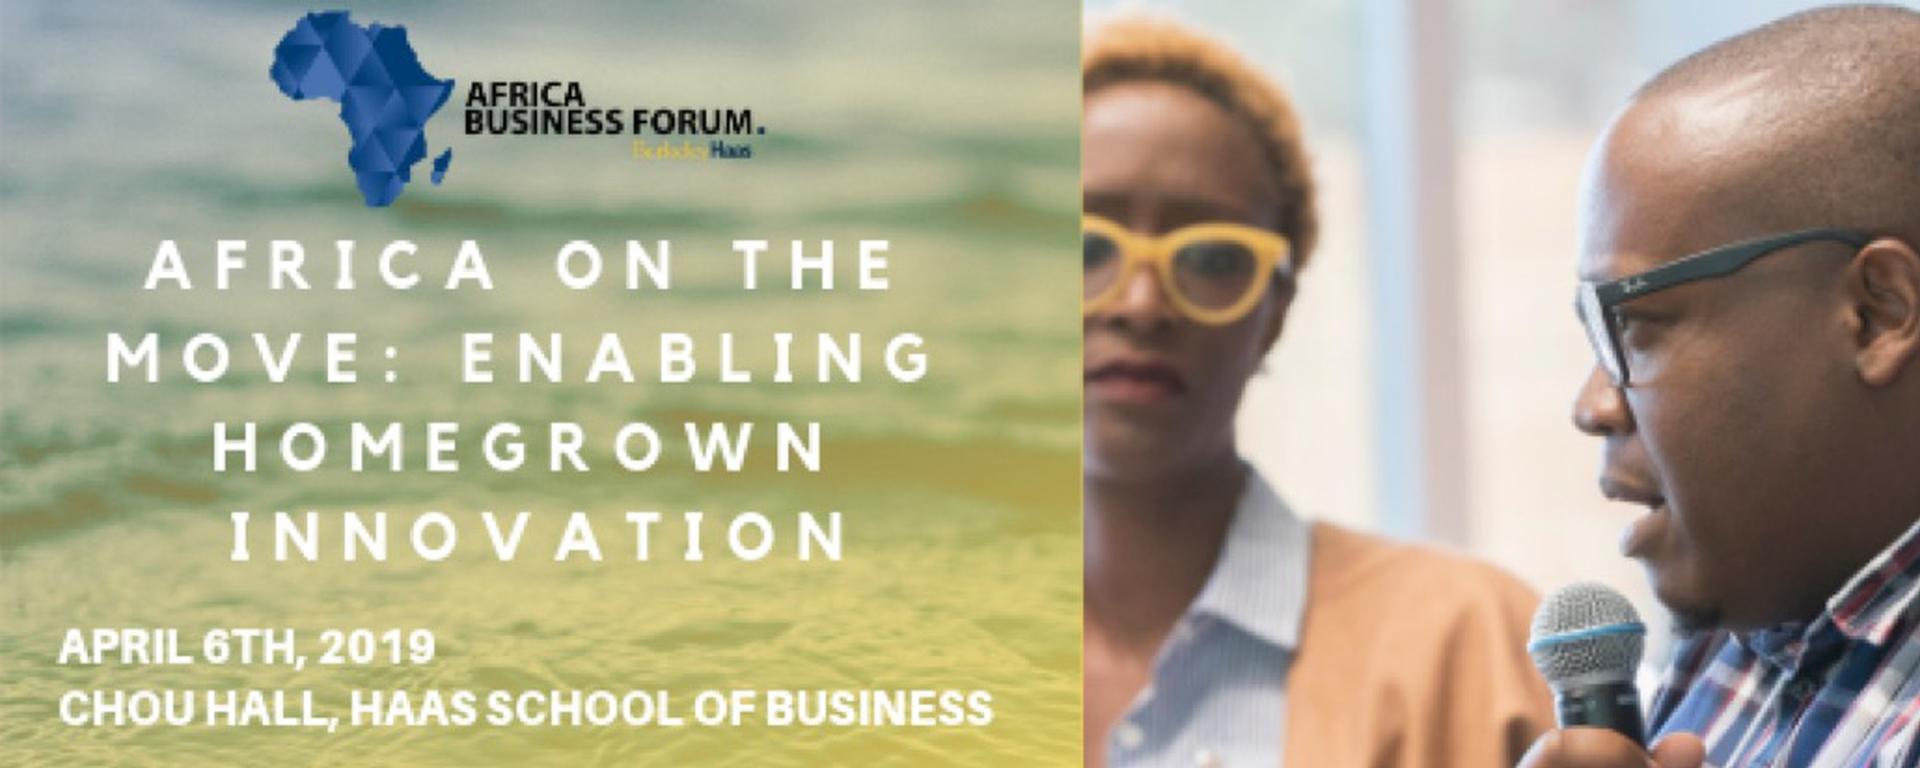 Berkeley-Haas School of Business - Berkeley-Haas Africa Business Forum Movemeback African event cover image